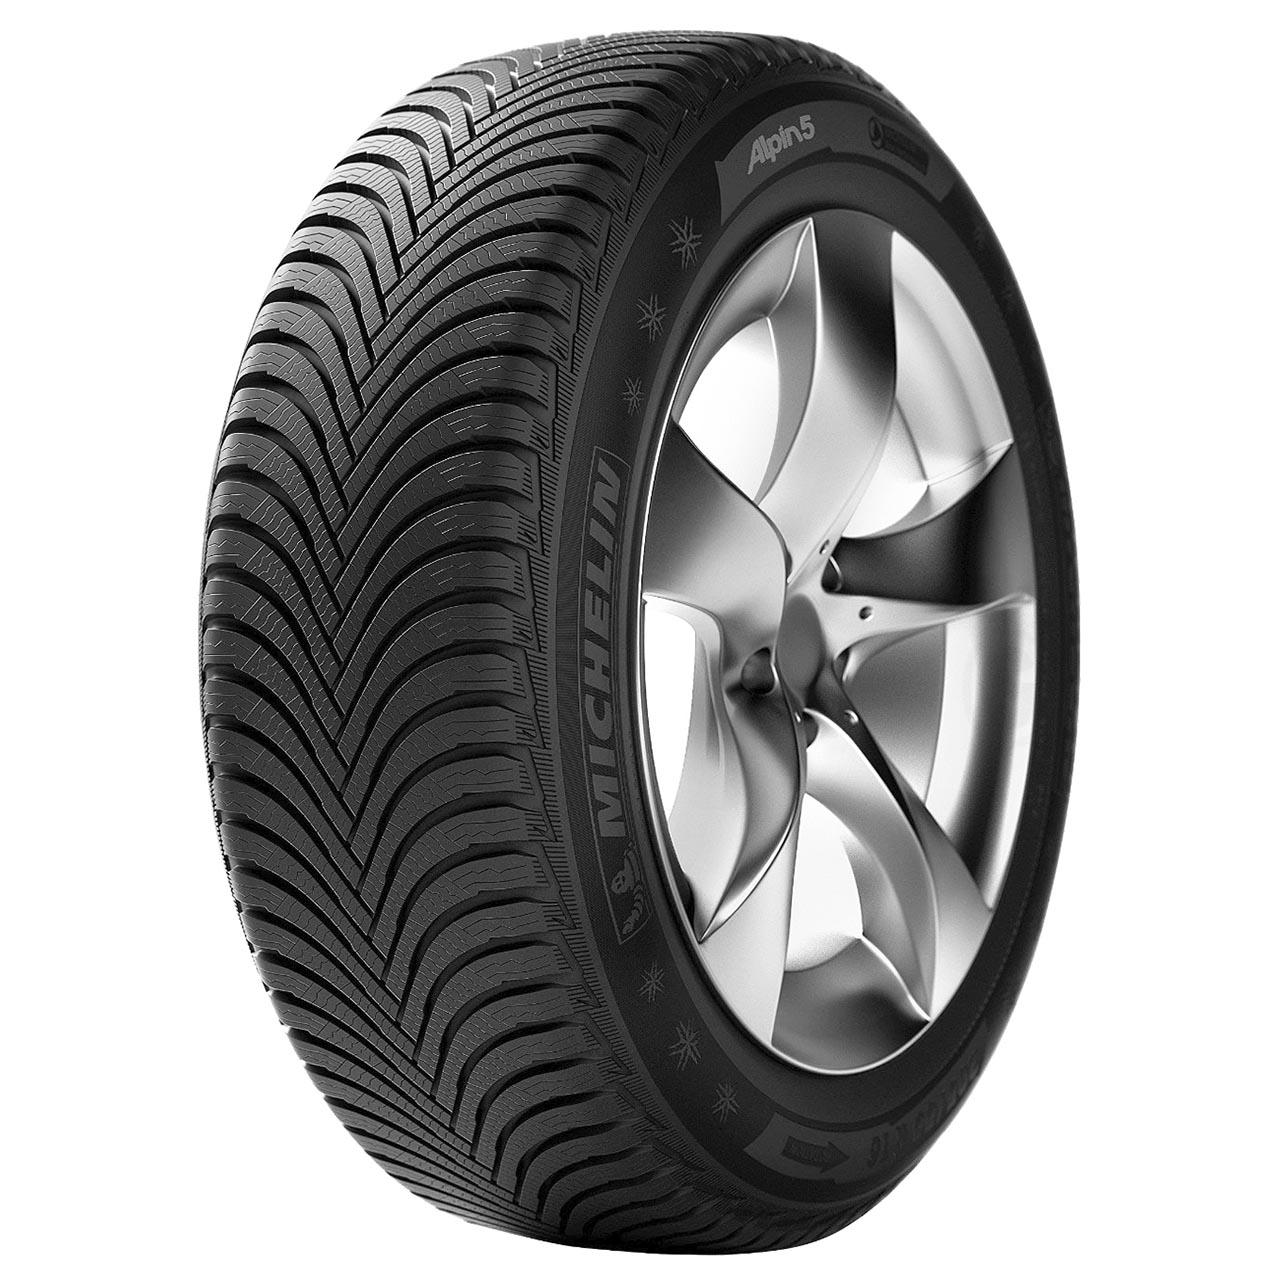 Michelin Pilot Alpin 5 235/55R17 103H XL